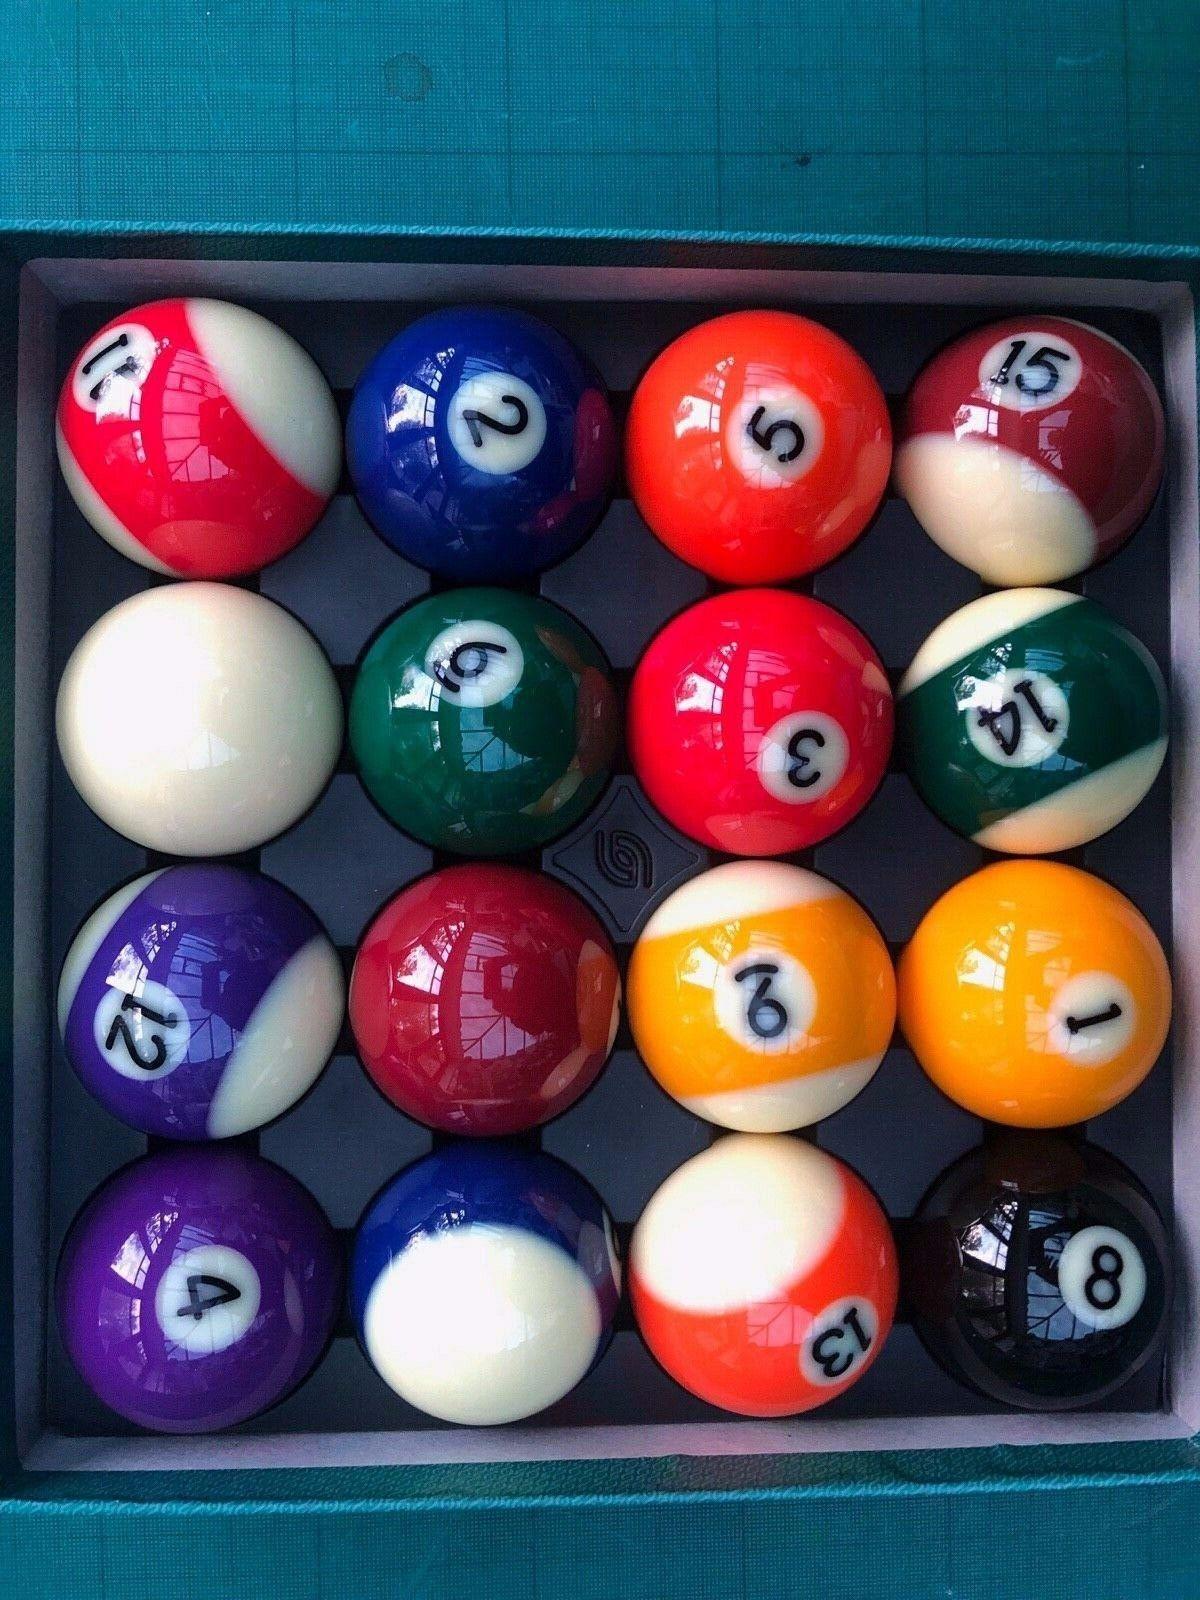 BILLIARD SNOOKER POOL BALLS ARAMITH PREMIUM 2 1/4 balls NEW